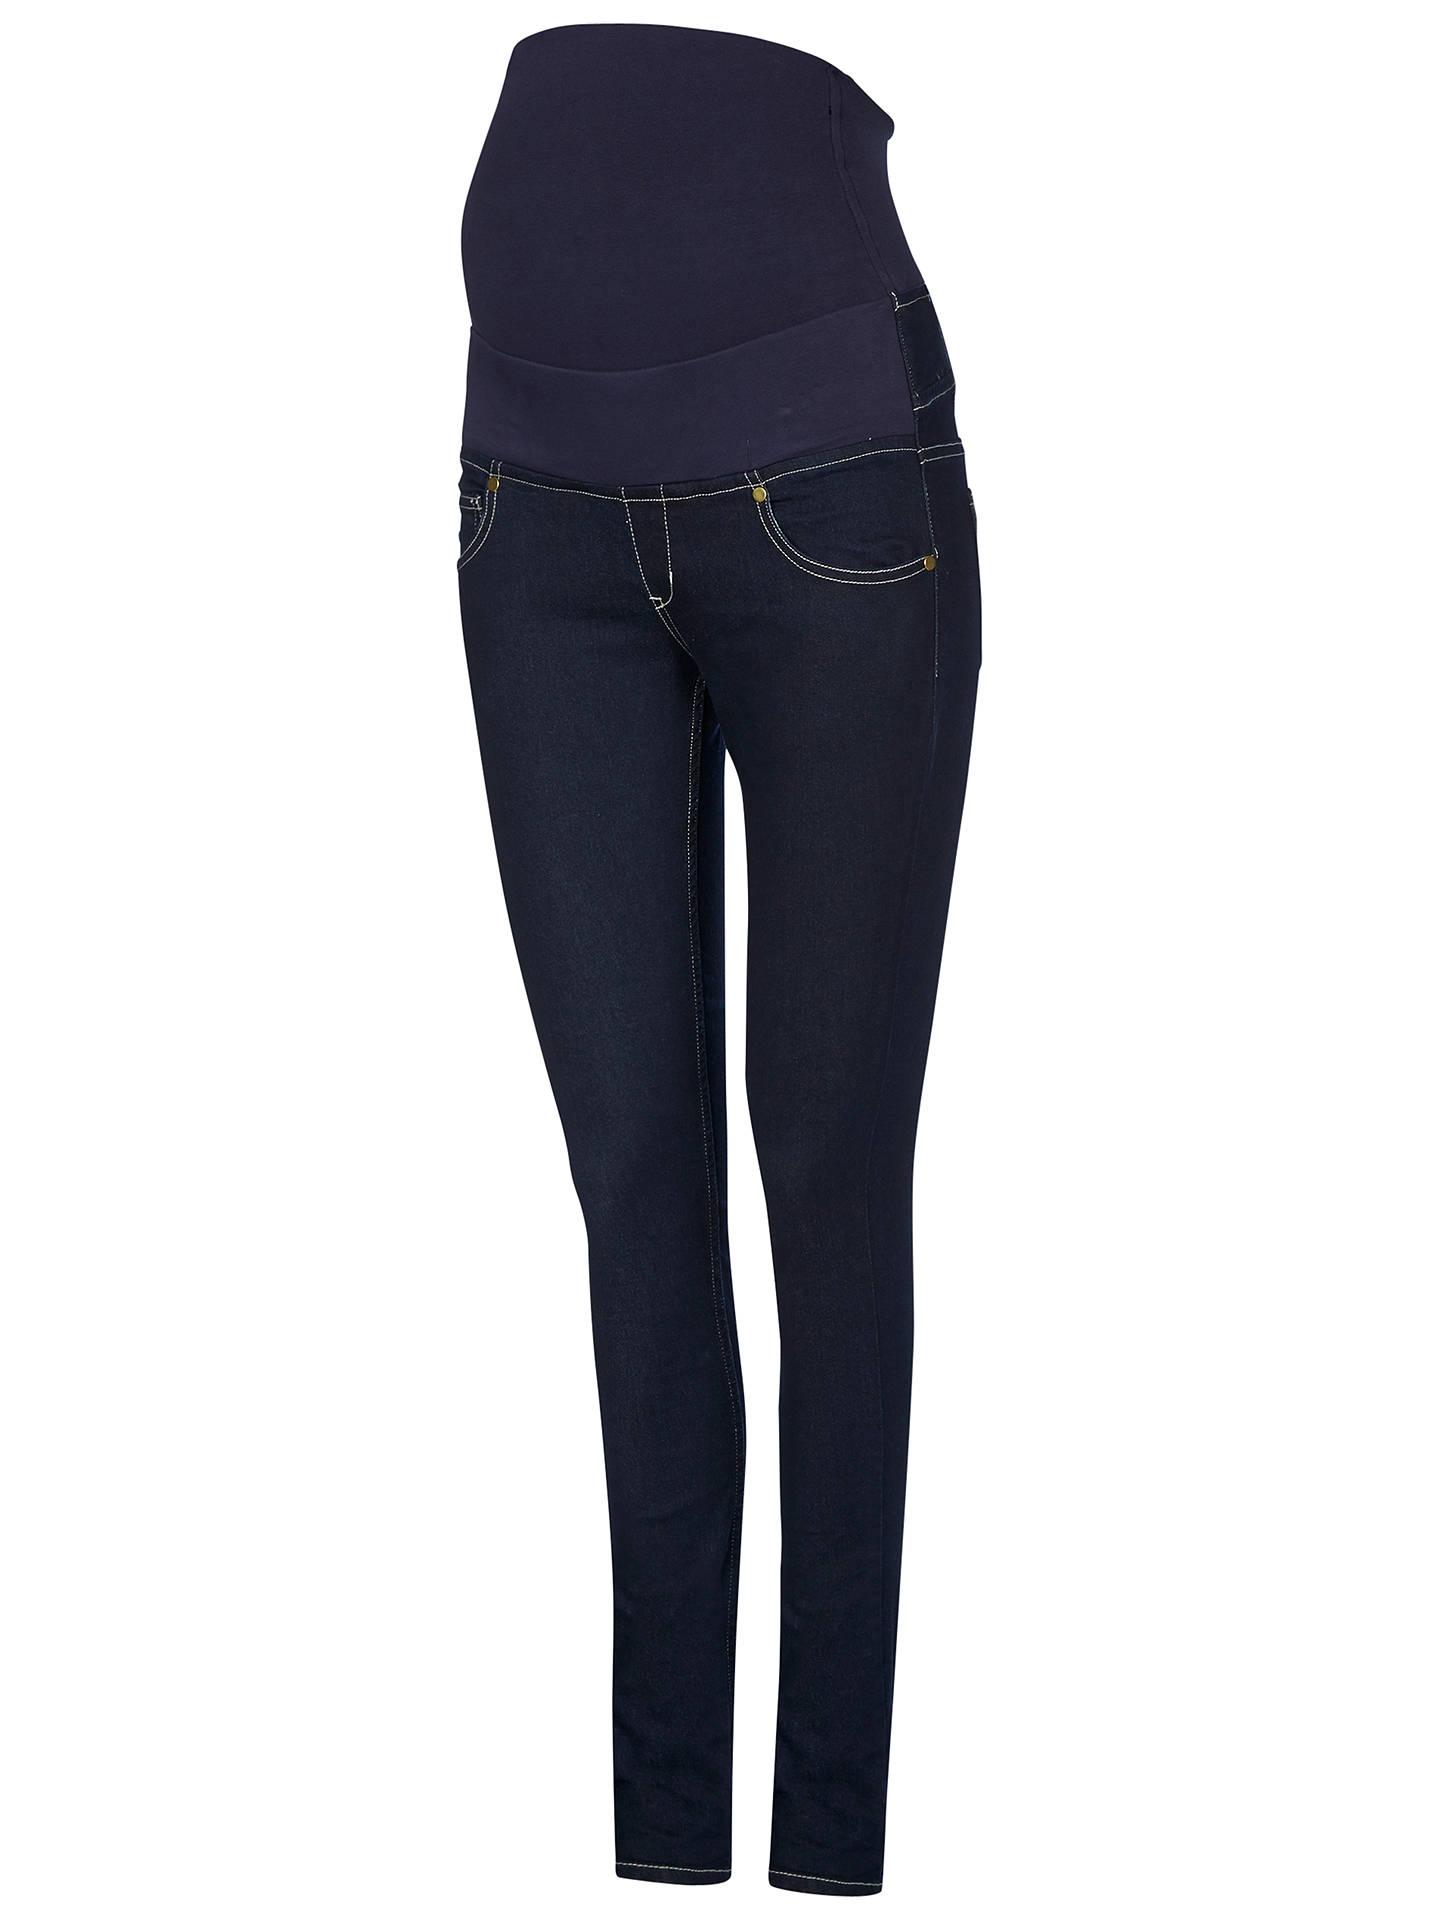 b555a4083a9f5 Buy Isabella Oliver Zadie Super Stretch Skinny Denim Maternity Jeans,  Indigo, 8 Online at ...